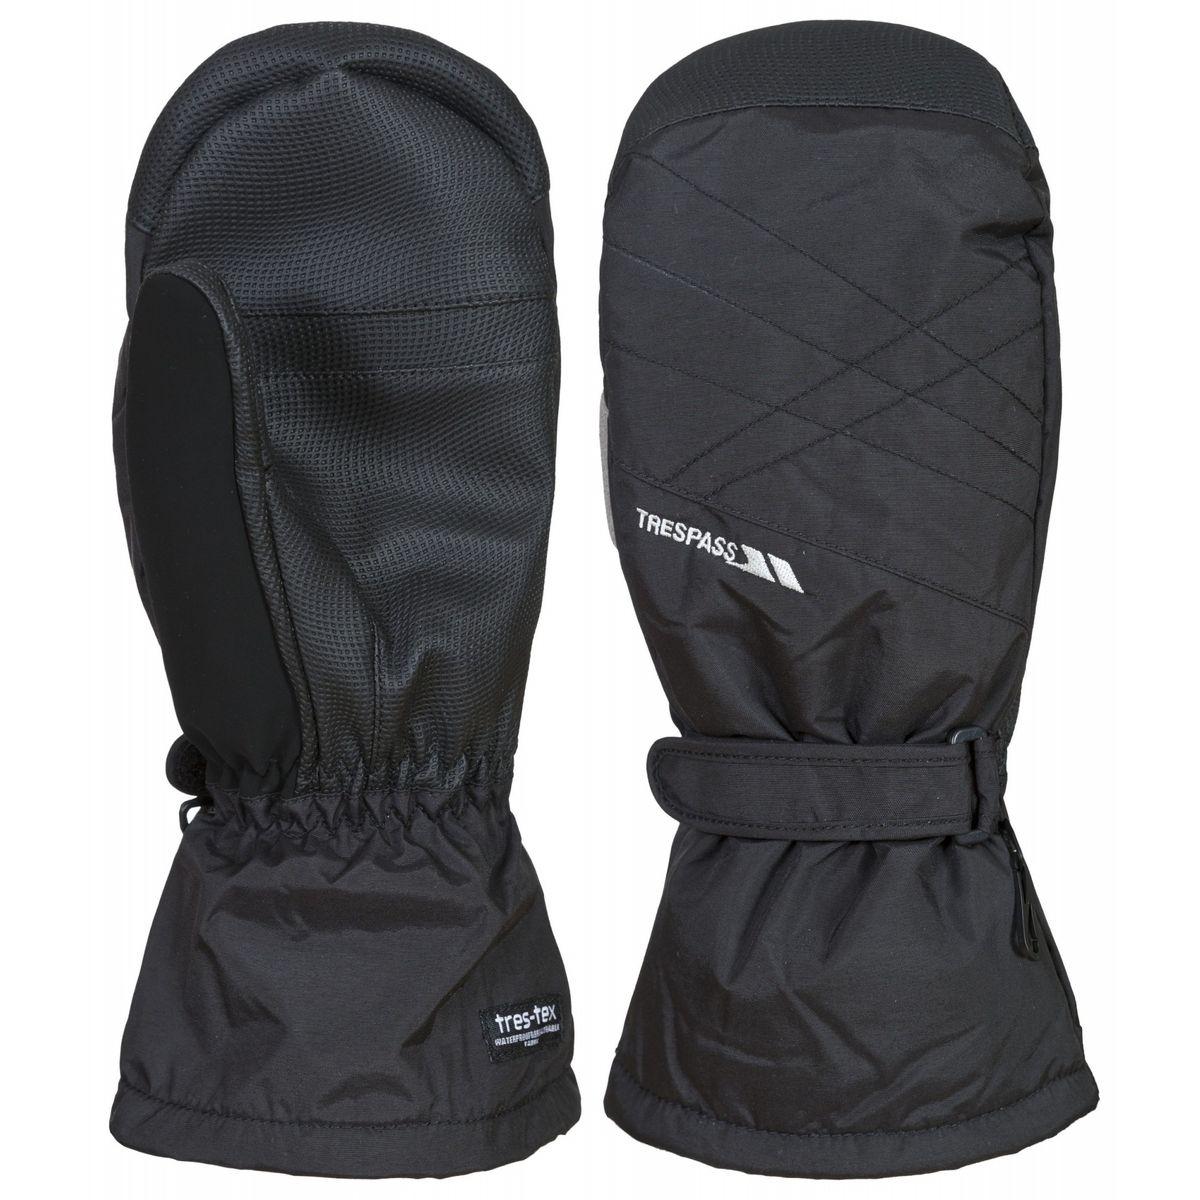 Moufles de ski IKEDA